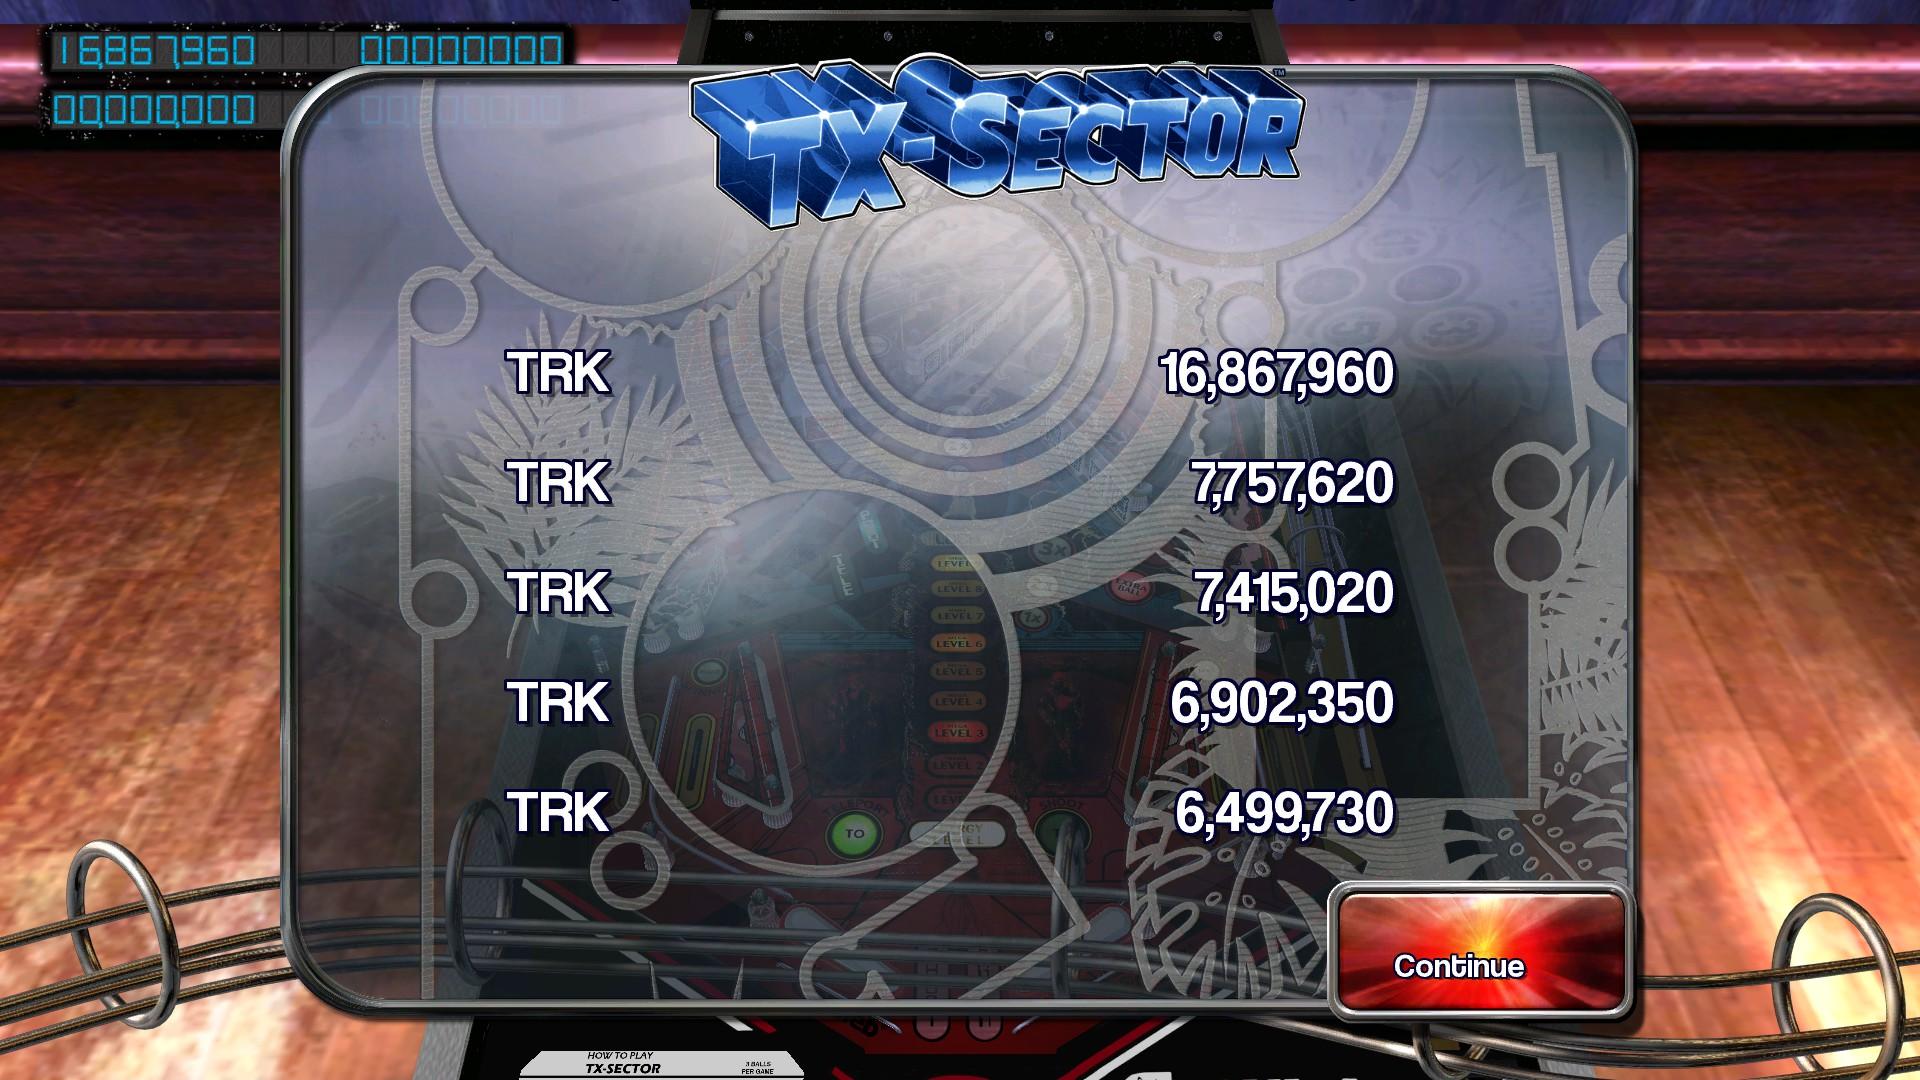 Pinball Arcade: TX-Sector 16,867,960 points